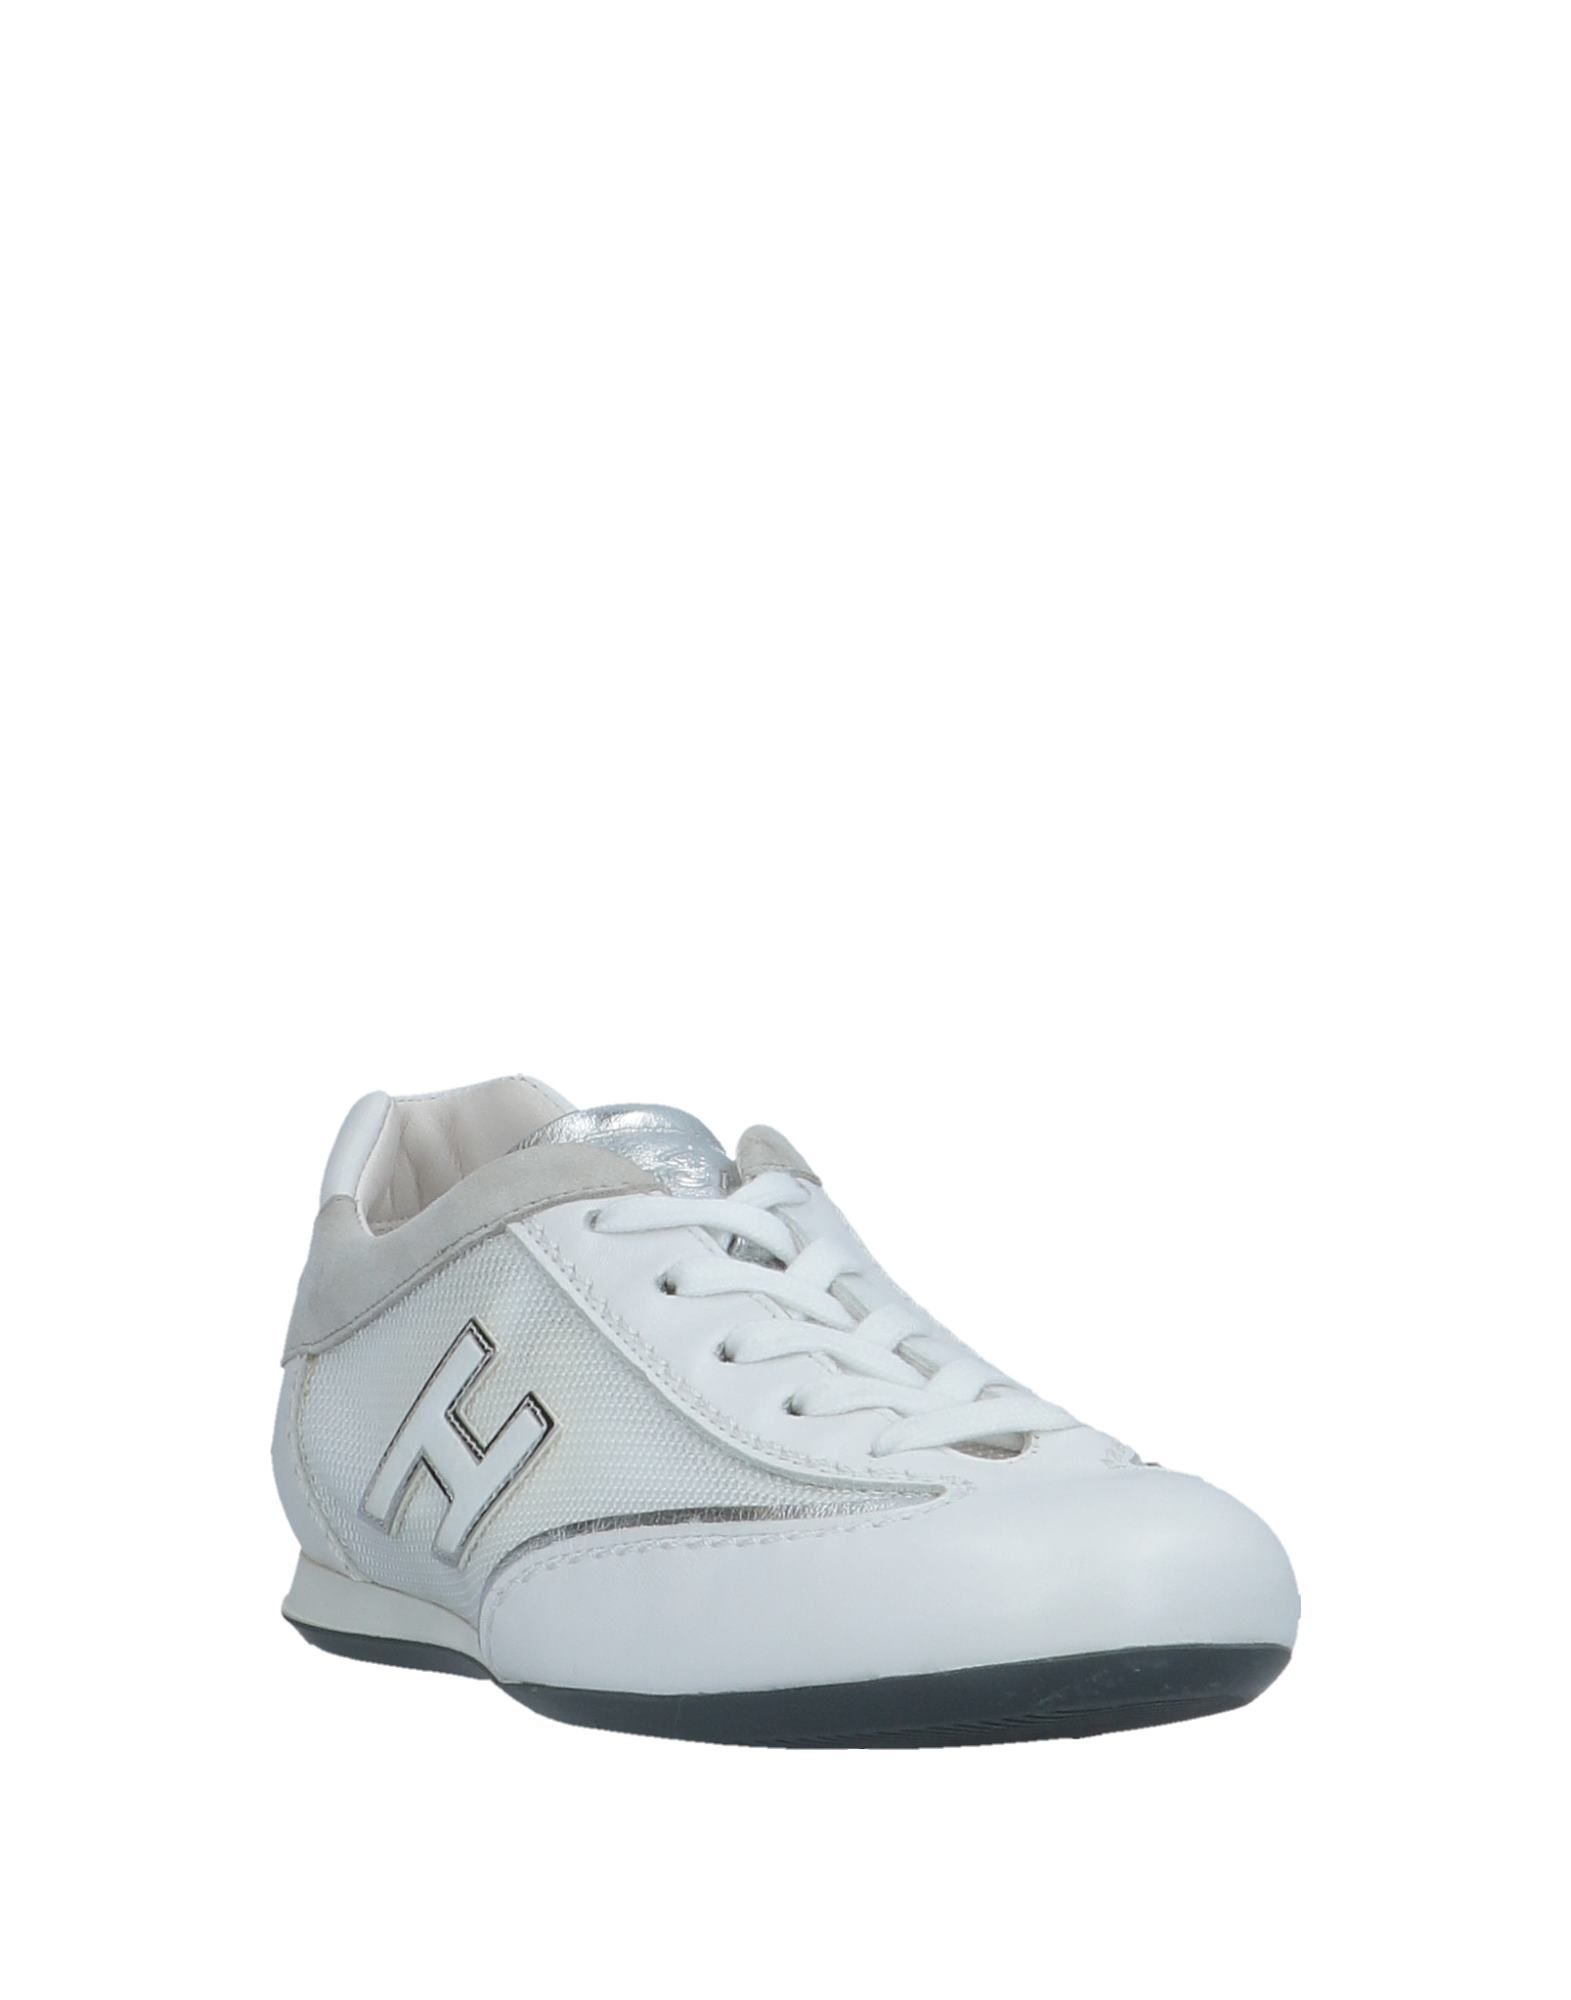 Hogan Sneakers - - - Women Hogan Sneakers online on  United Kingdom - 11517192FS 4691c2